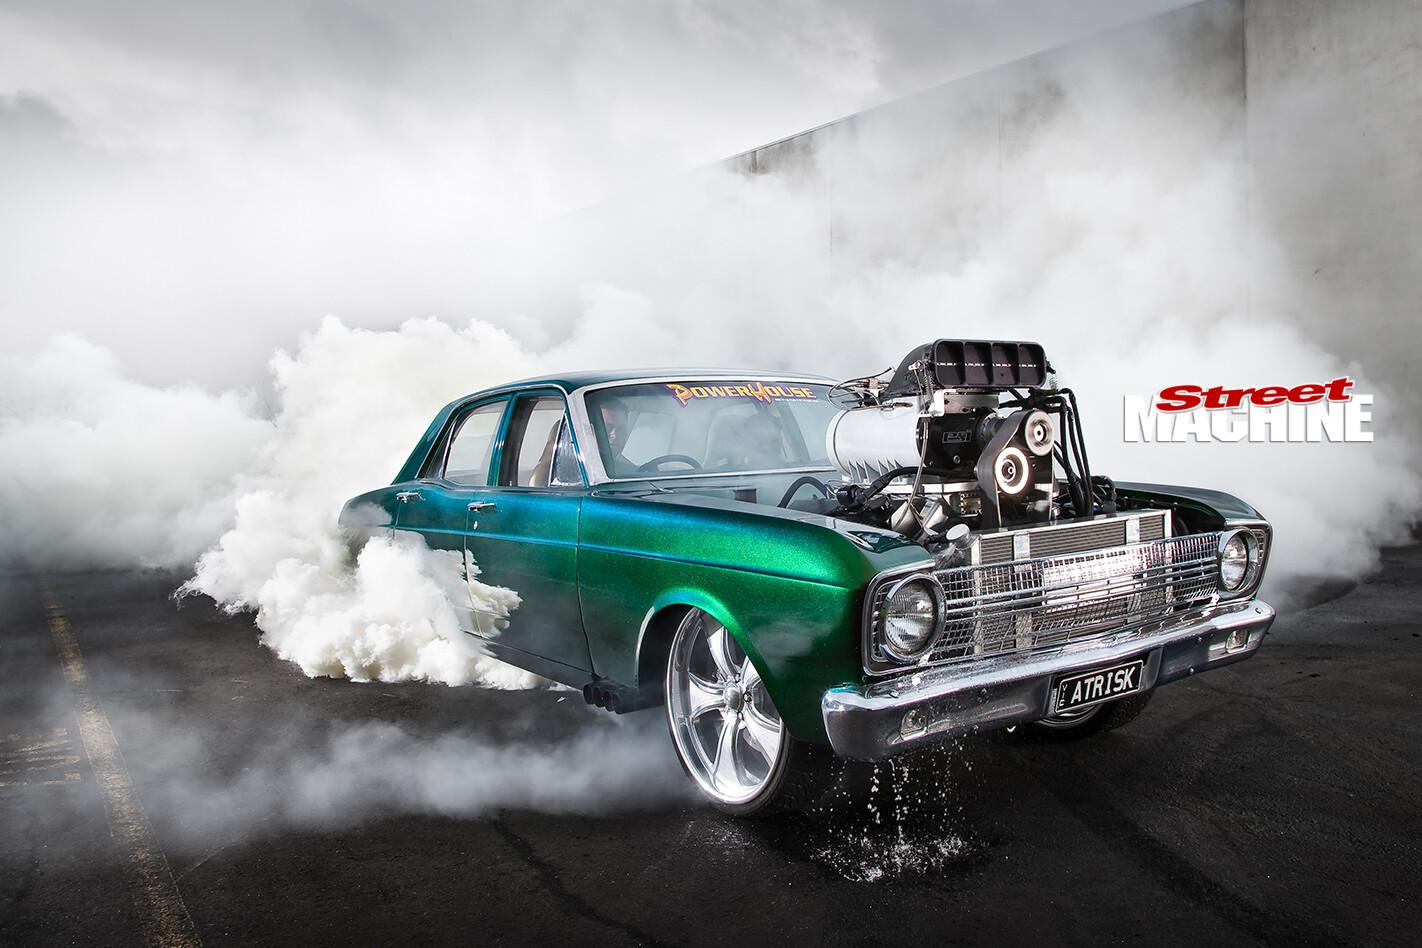 Ford -Falcon -XR-atrisk -burnout